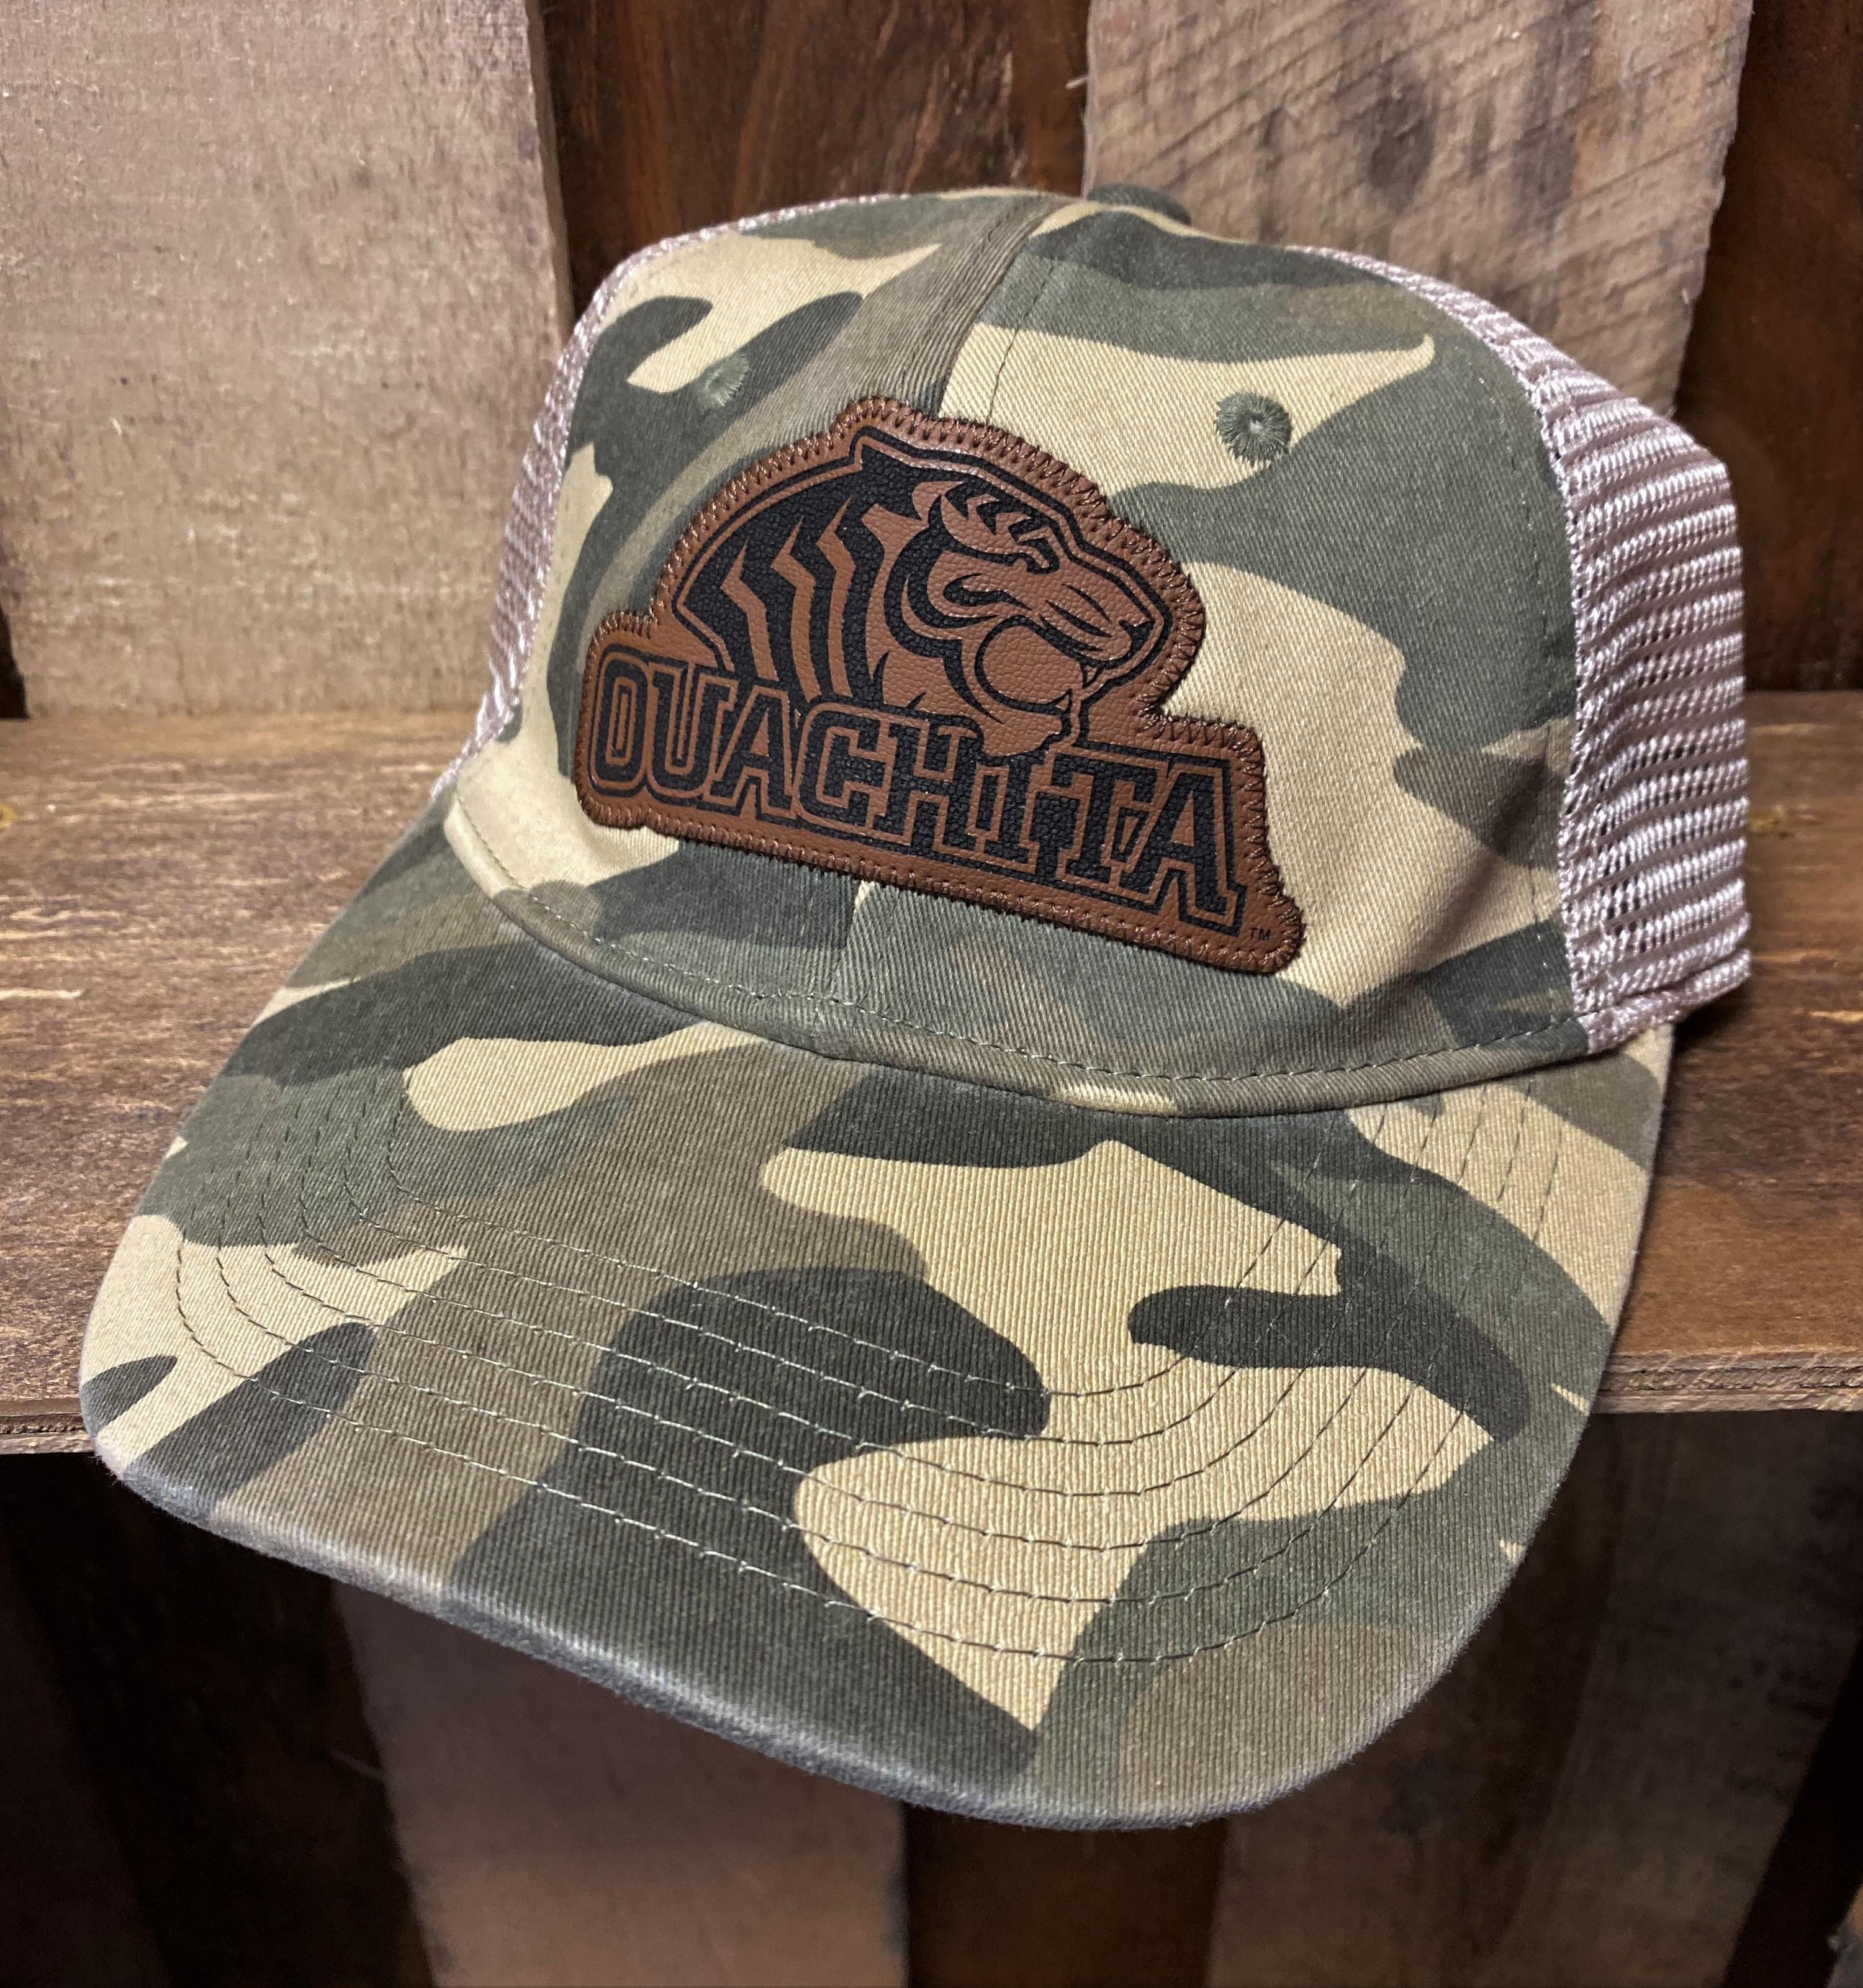 OUACHITA LEATHER MASCOT LO-PRO WASHED CAMO TRUCKER HAT